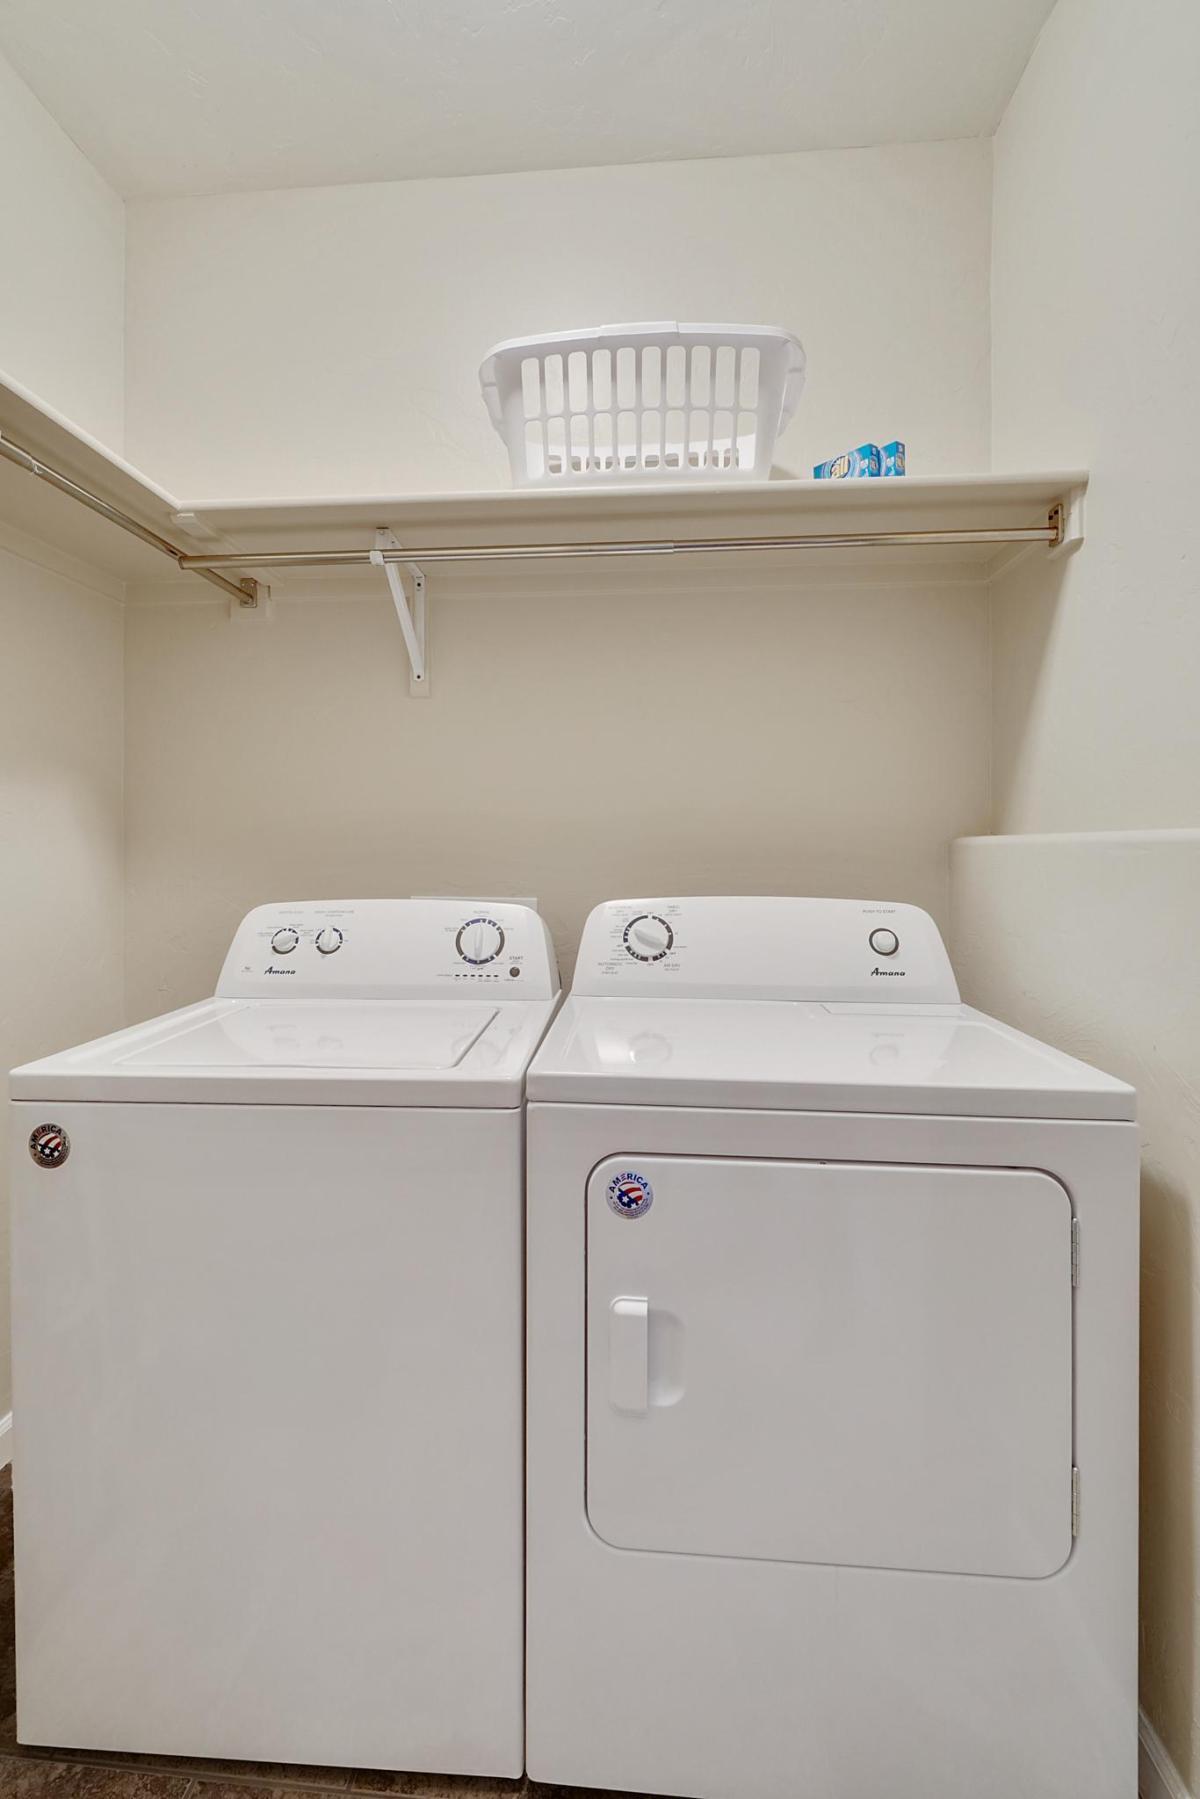 Black Bear II Laundry Room